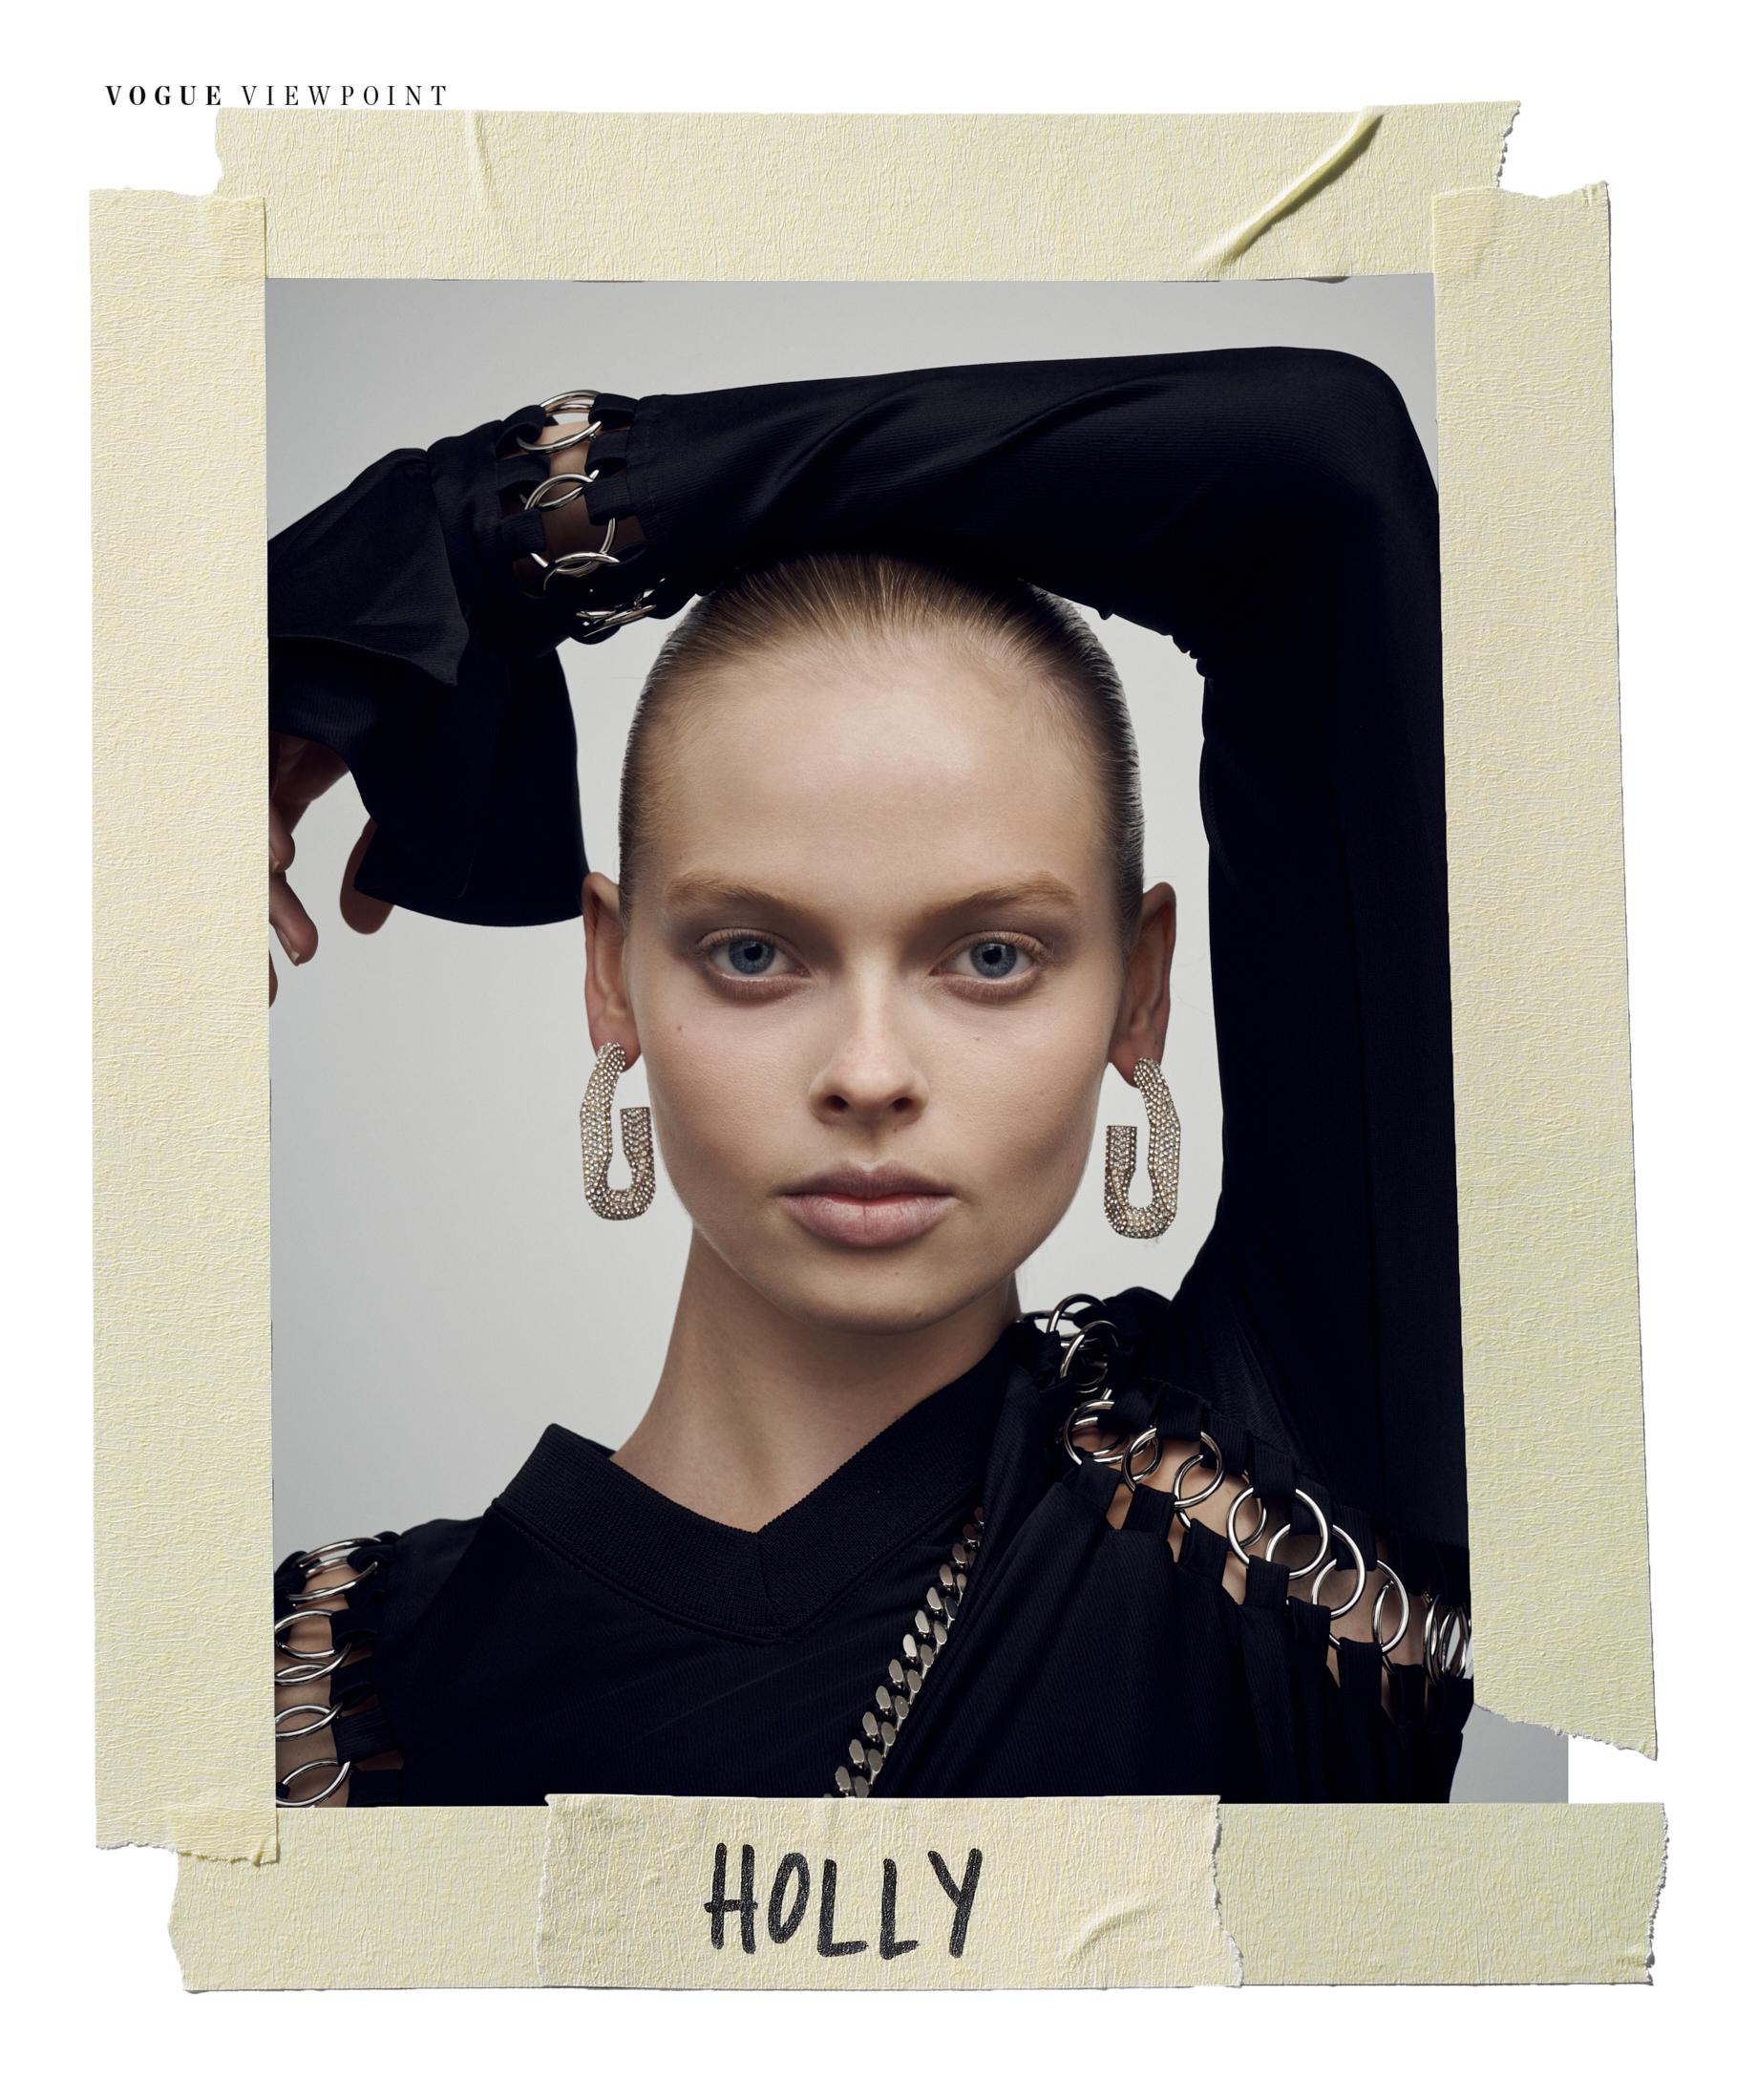 190815_Vogue_Burberry_SH03_Holly_1036_FINALS_TAPE 1.jpg